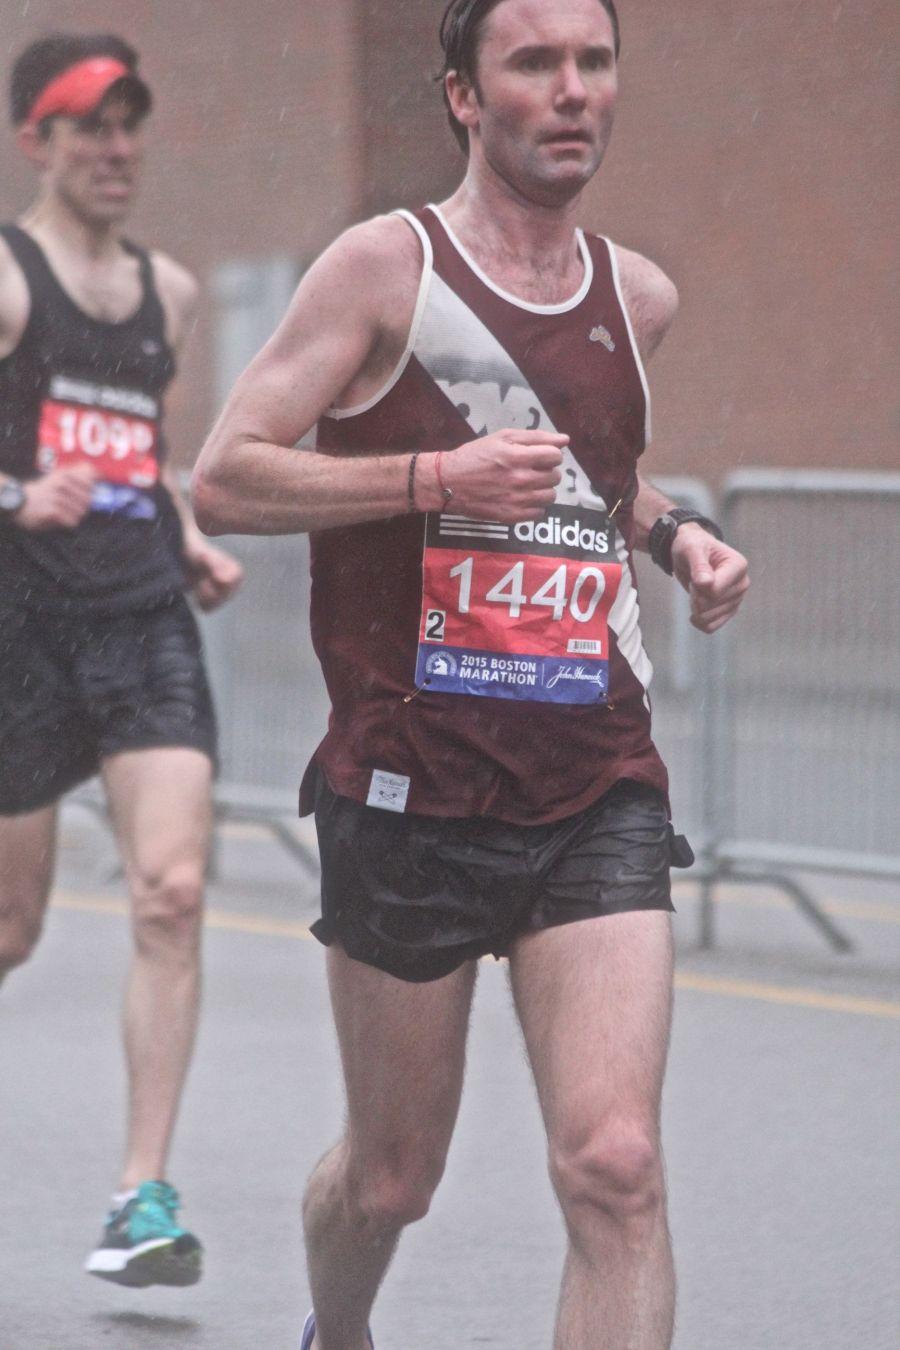 boston marathon april 20 2015 racer number 1440